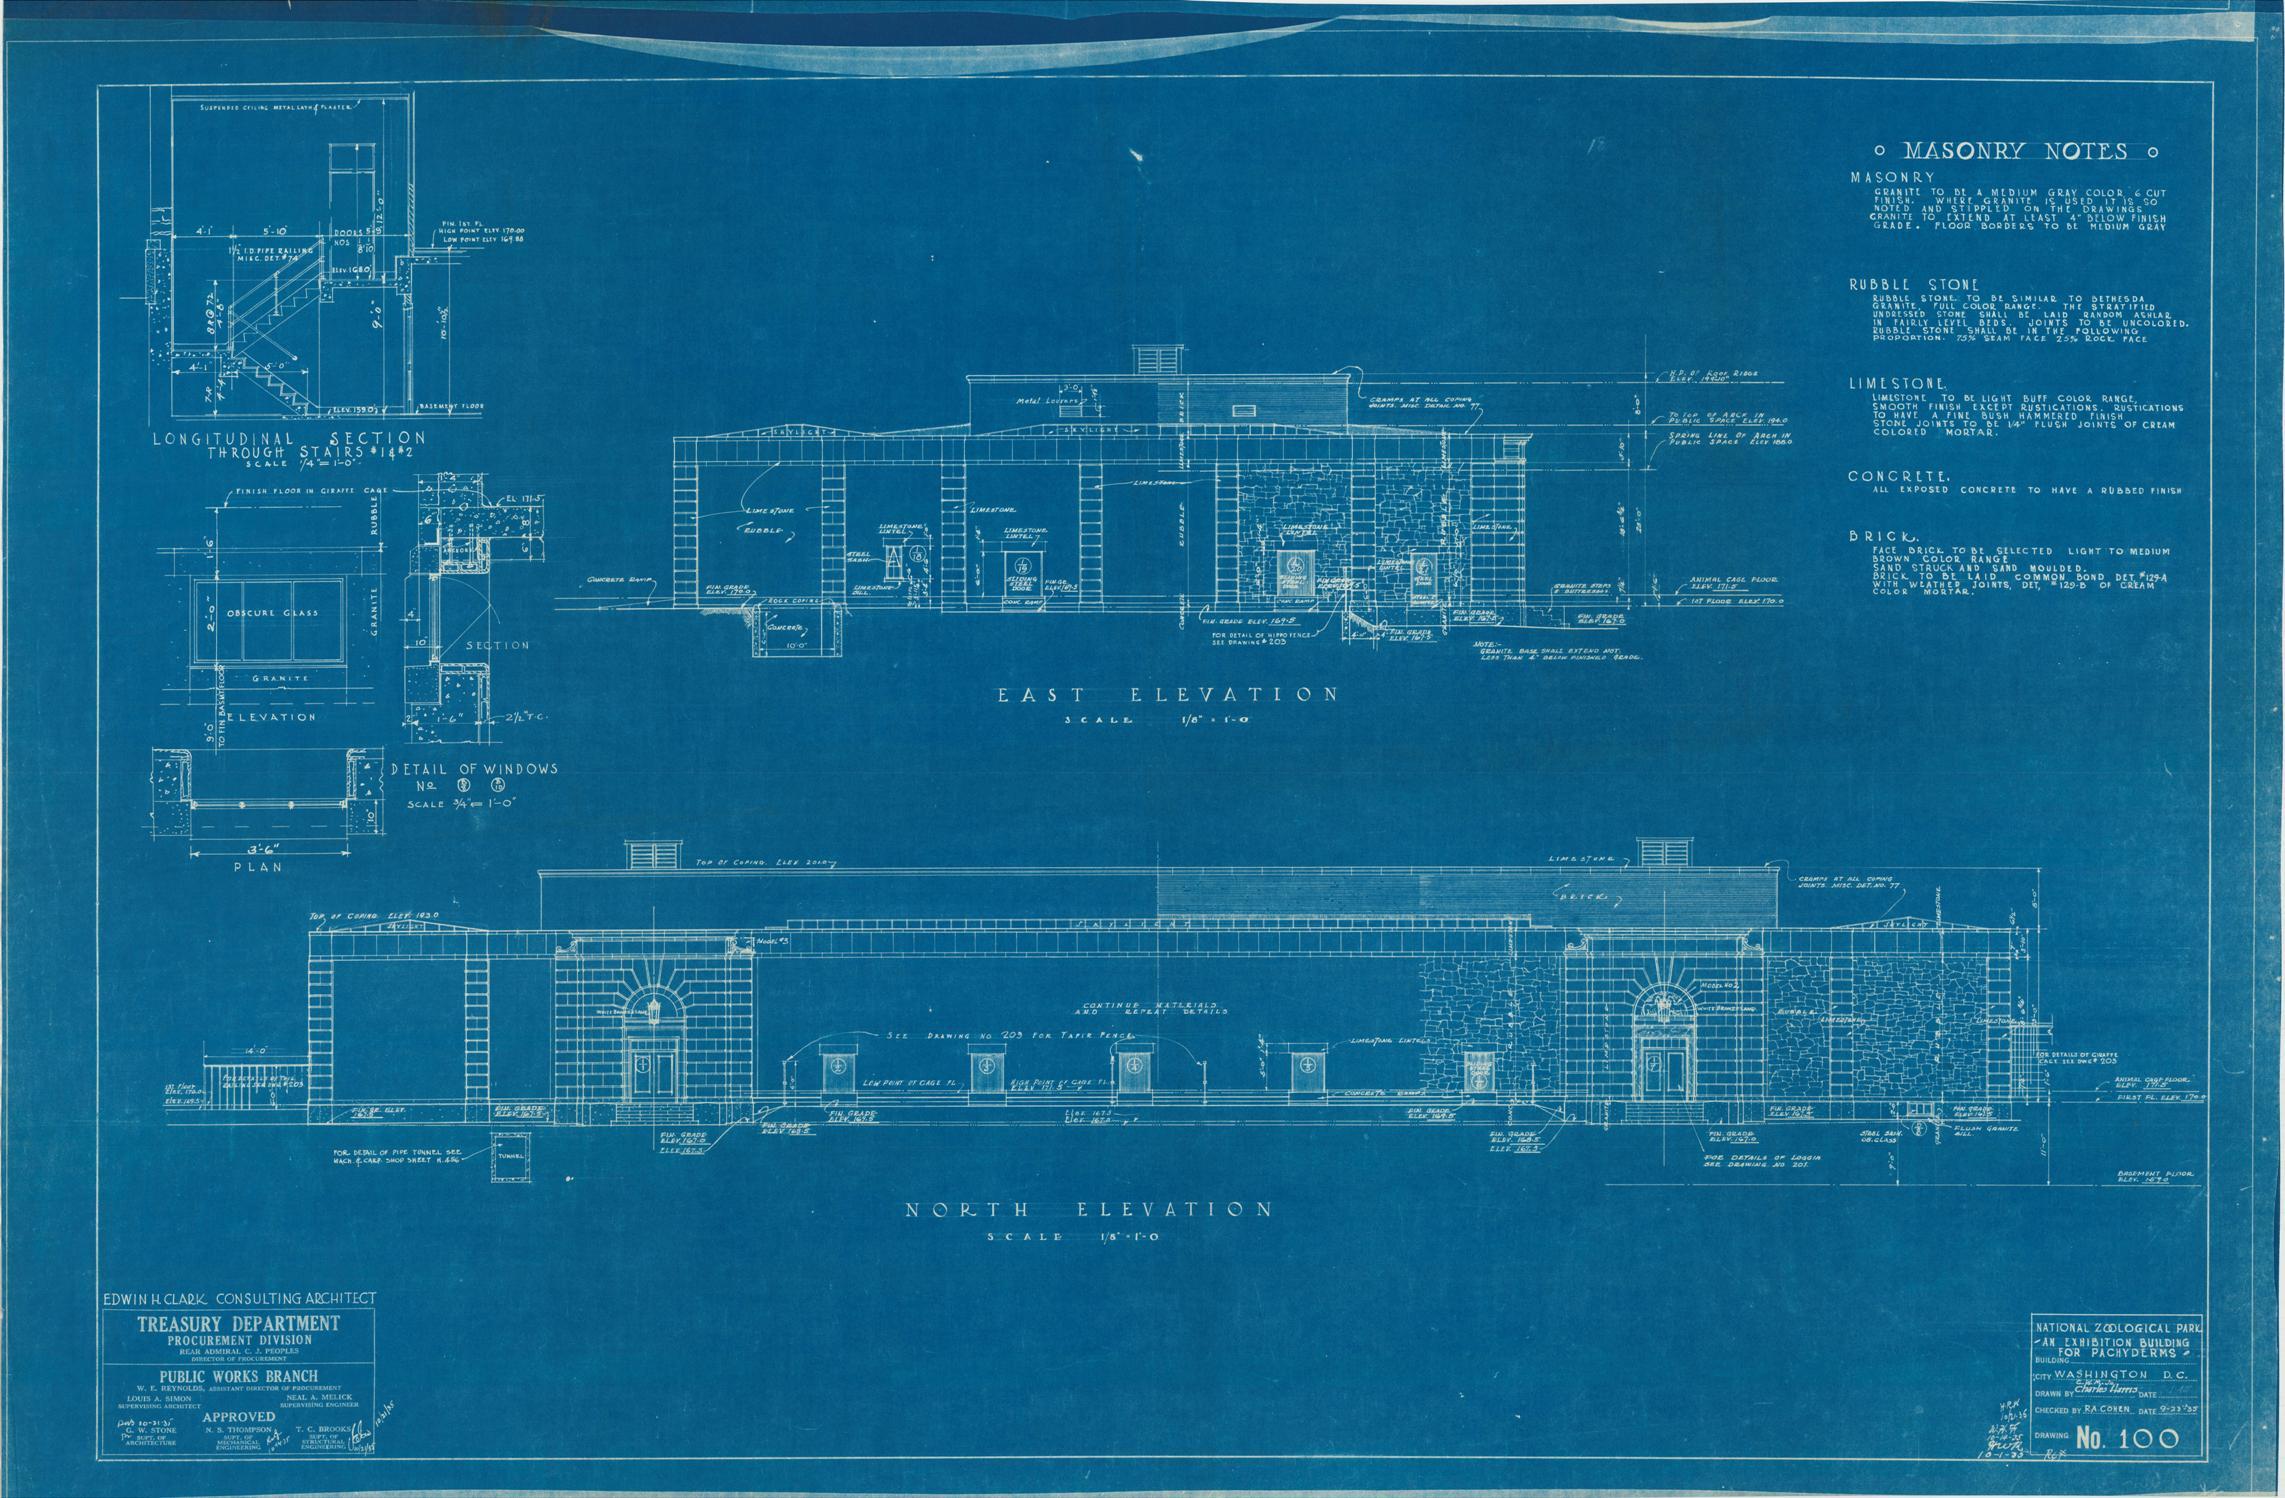 RG 121, Consolidated File, Washington, DC, National Zoo, #1